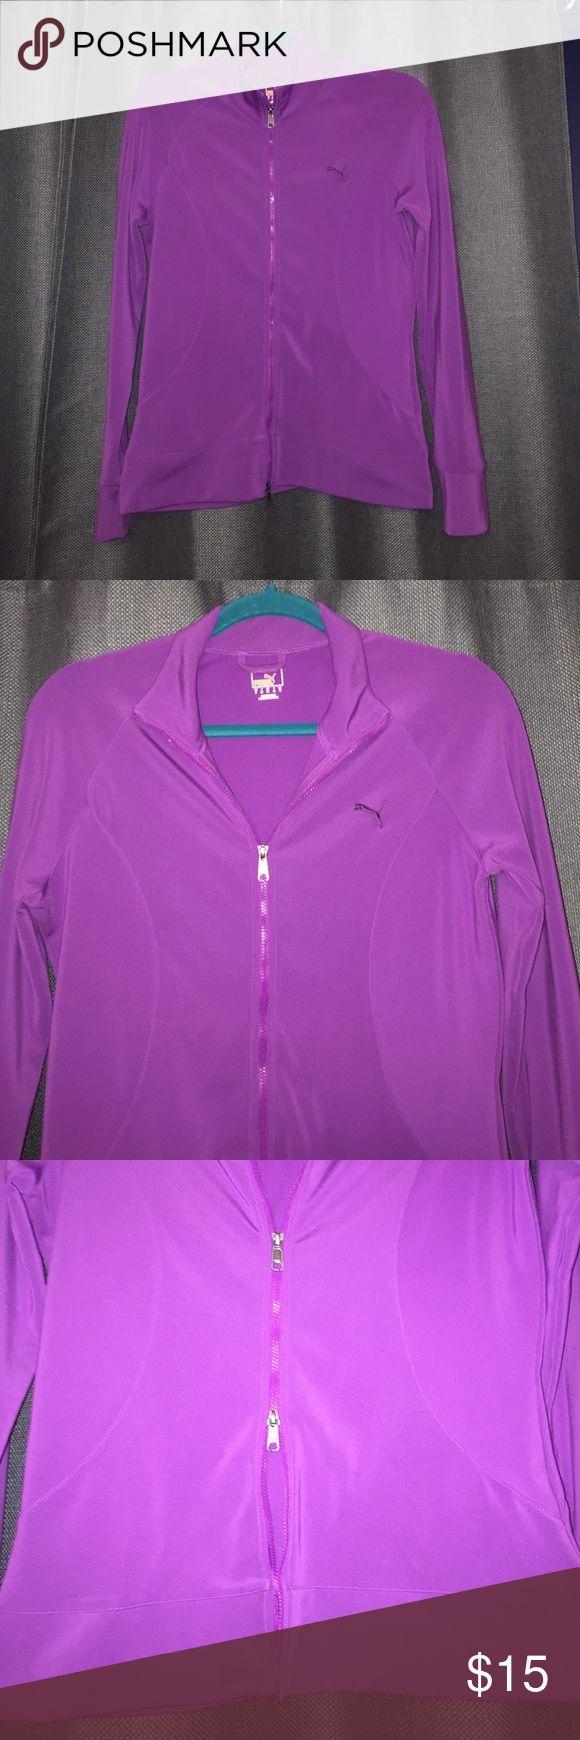 8dd4ce0b9d3d puma jacket purple on sale   OFF61% Discounts